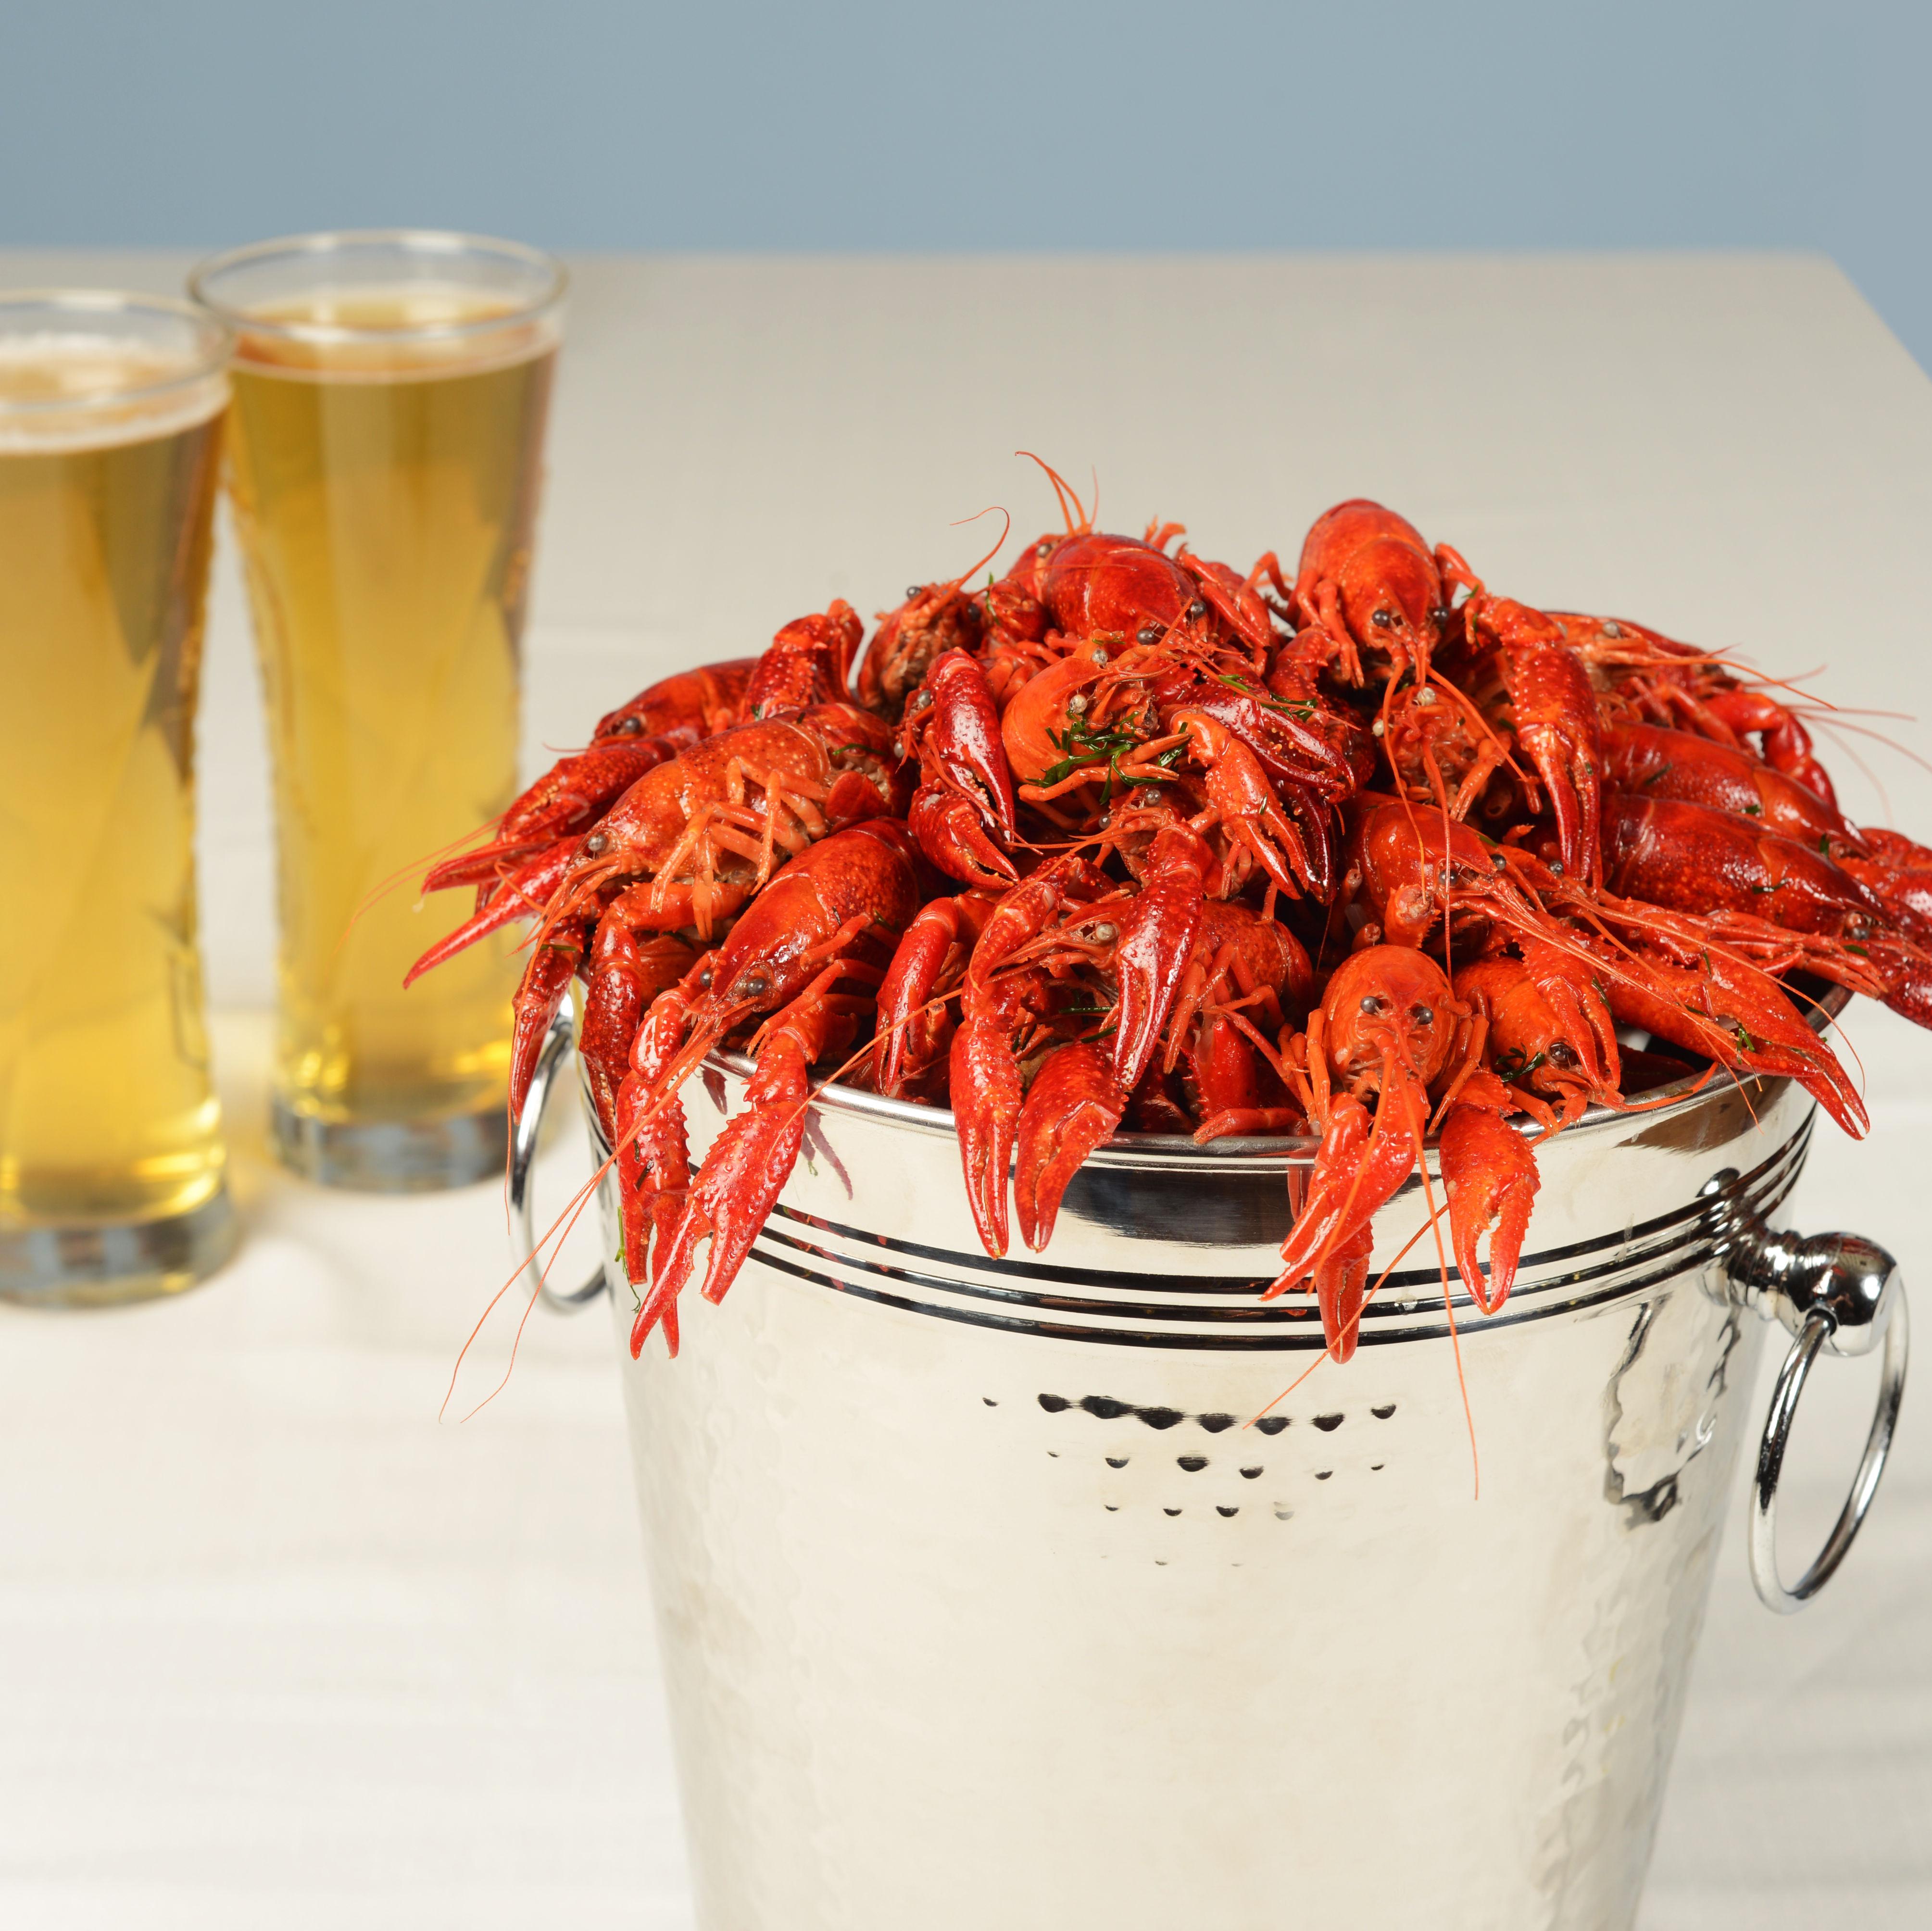 0317 crawfish feature beer and crawfish qb33du